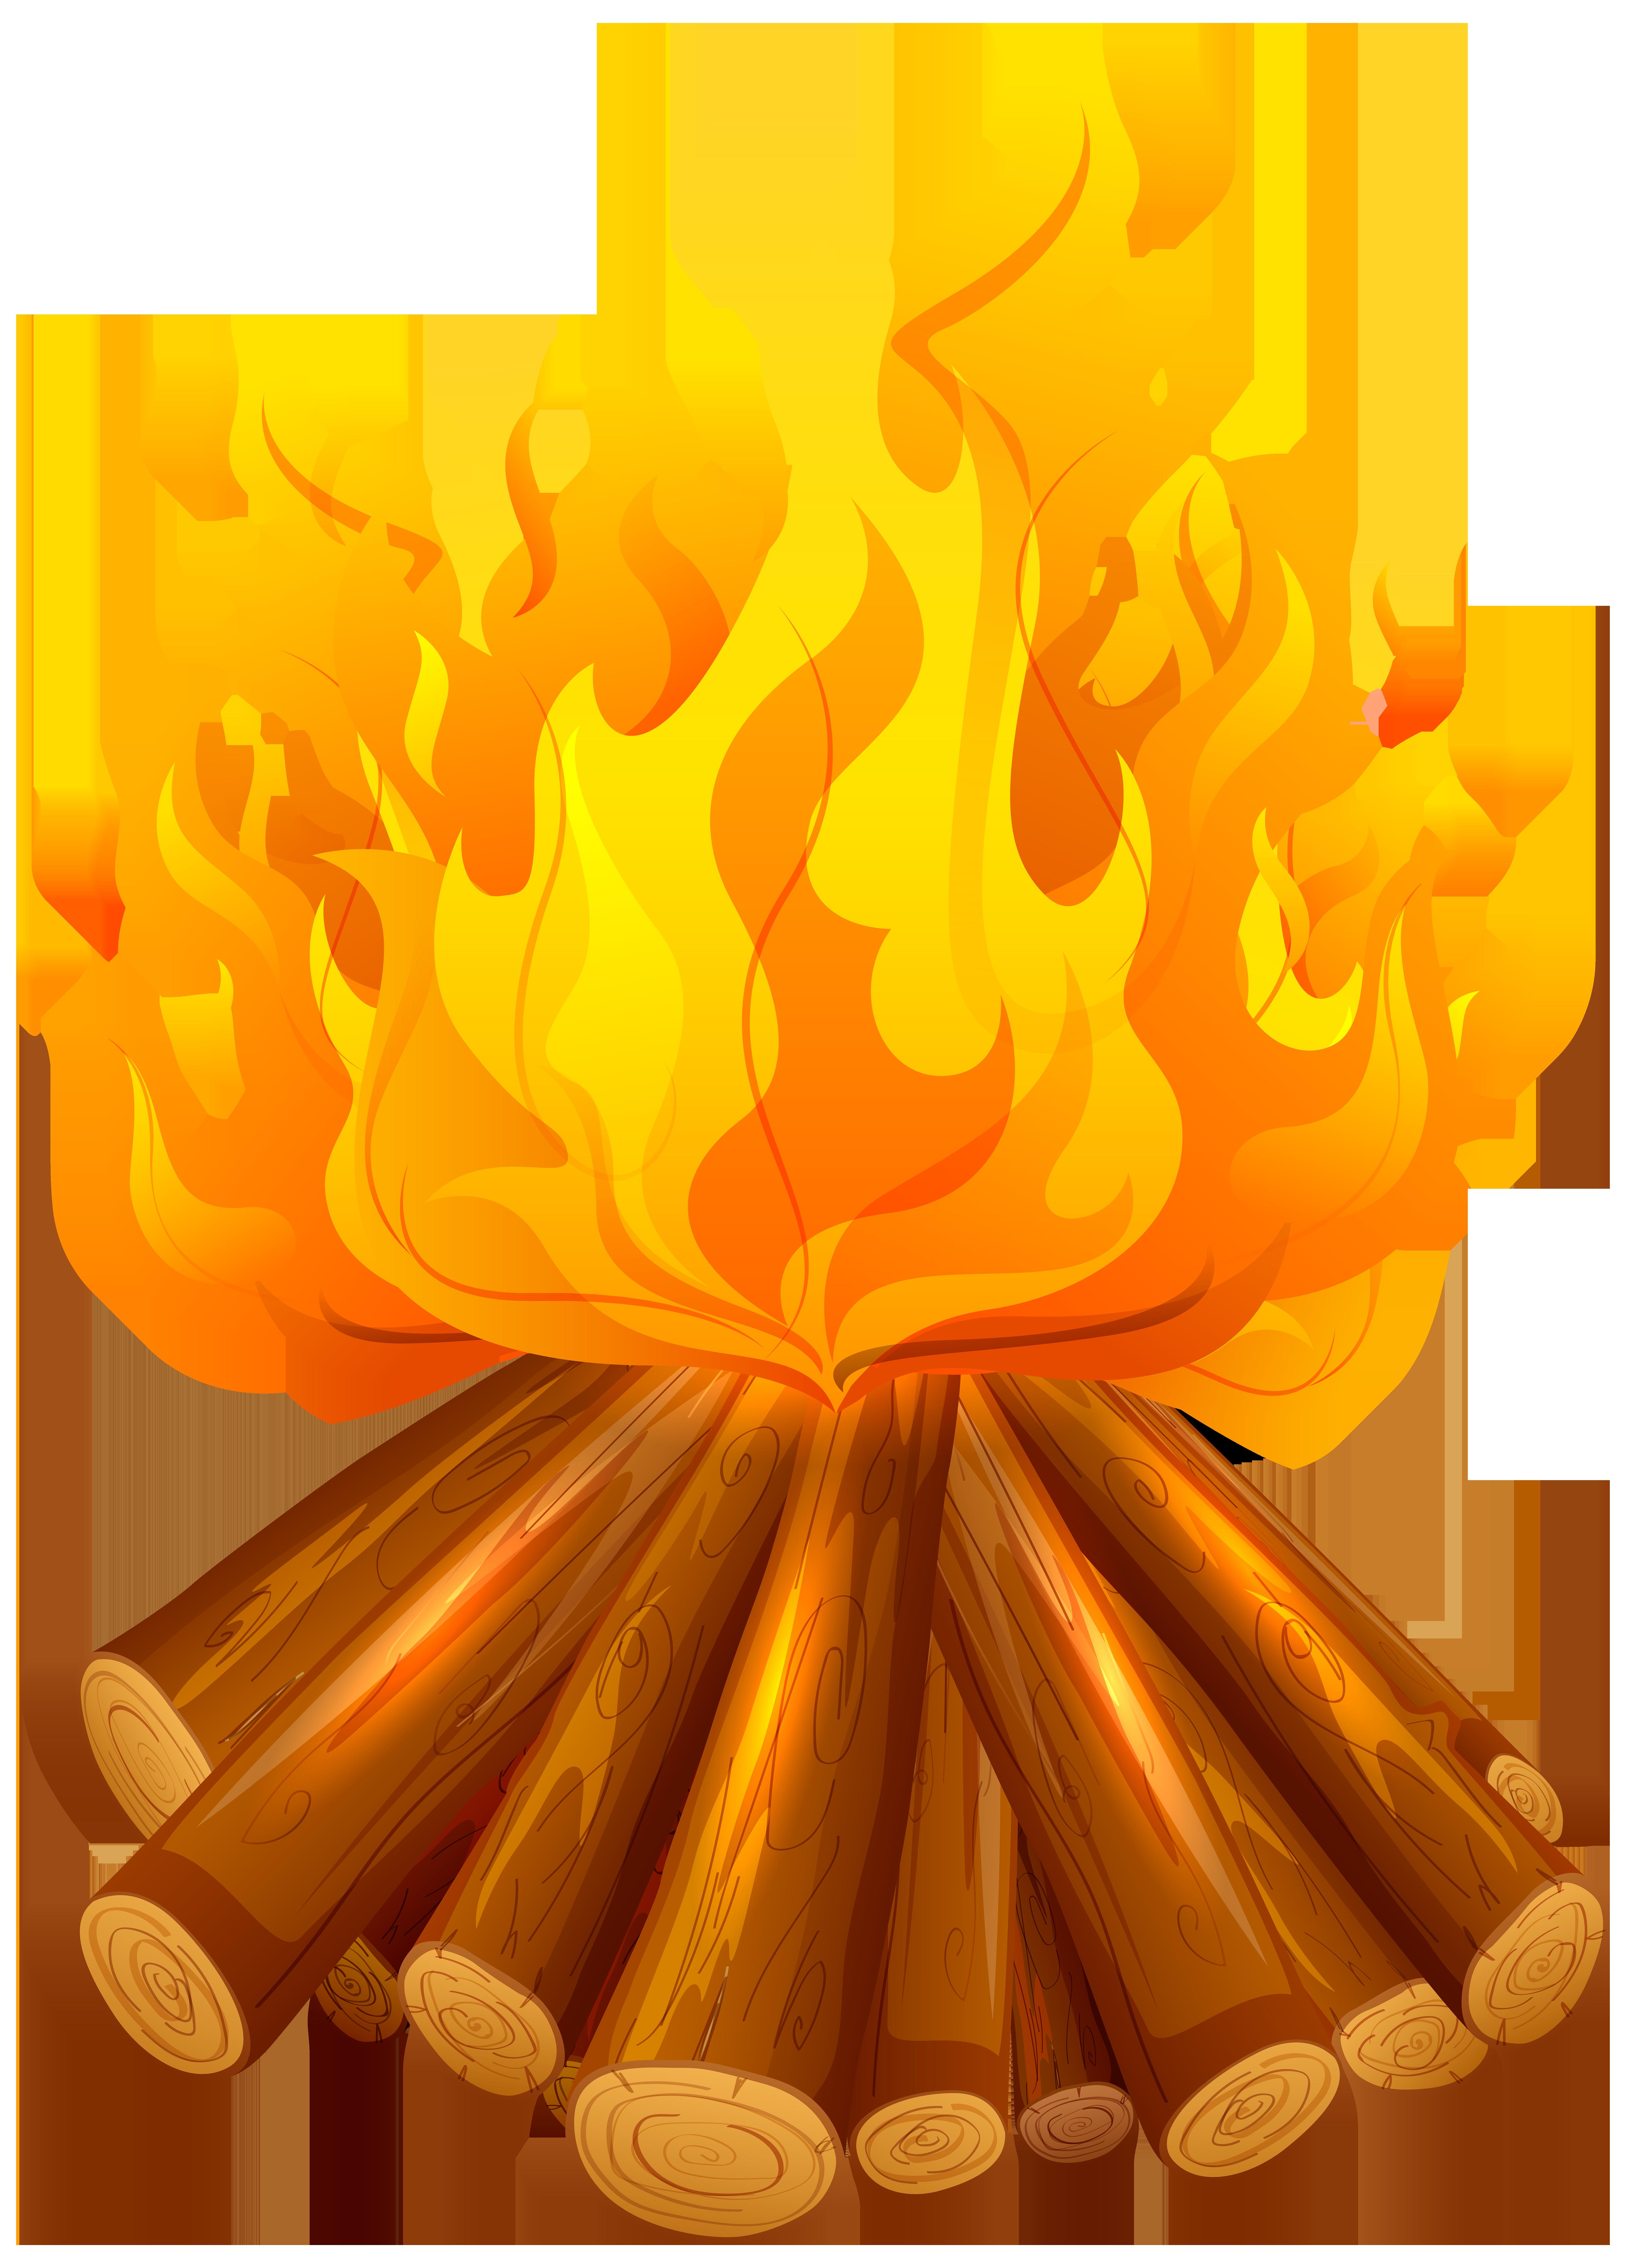 Fire clipart beach. Free png clip art